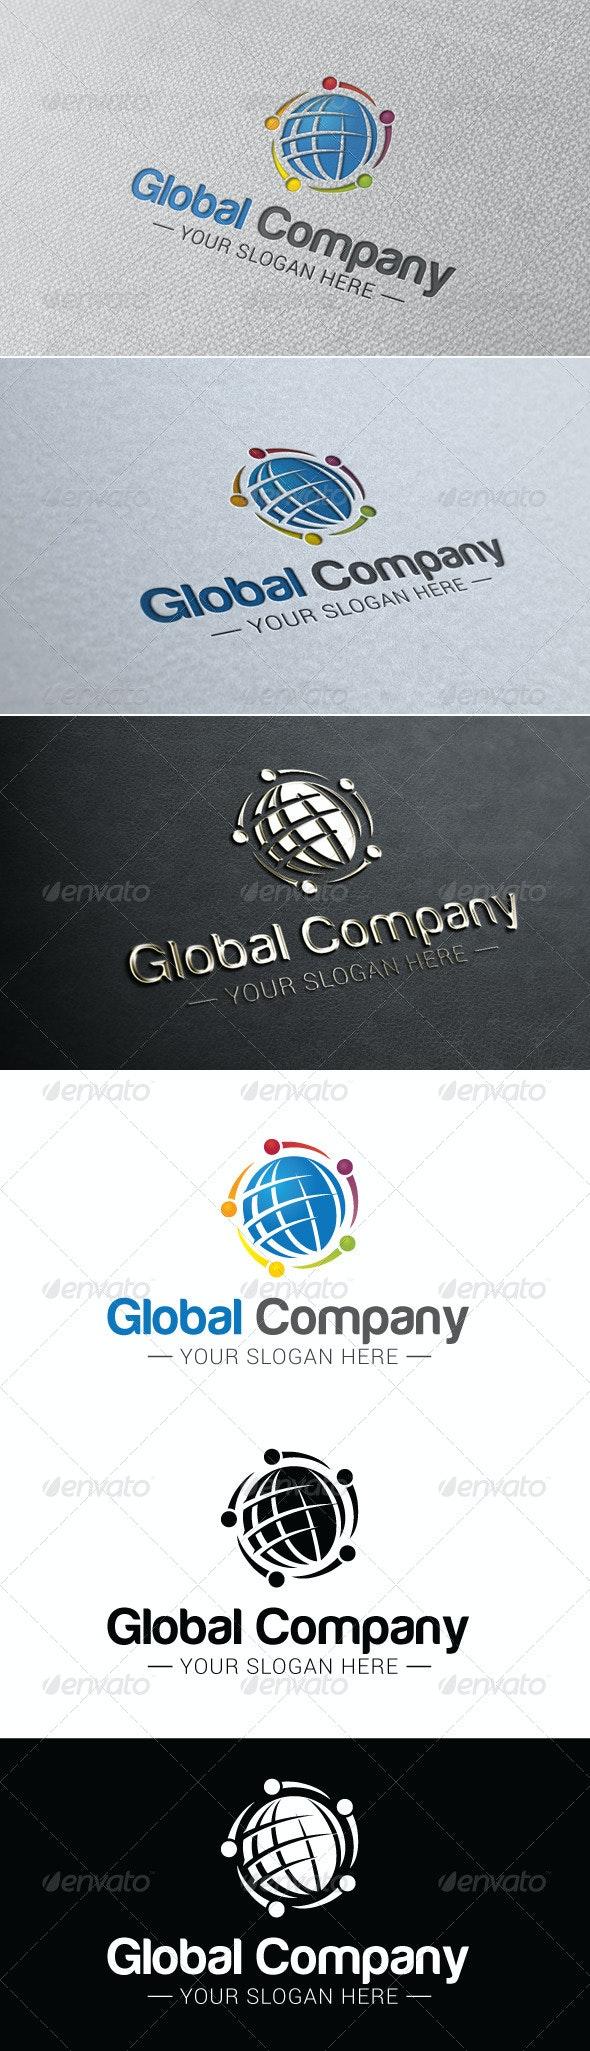 Global Company Logo Template - Company Logo Templates